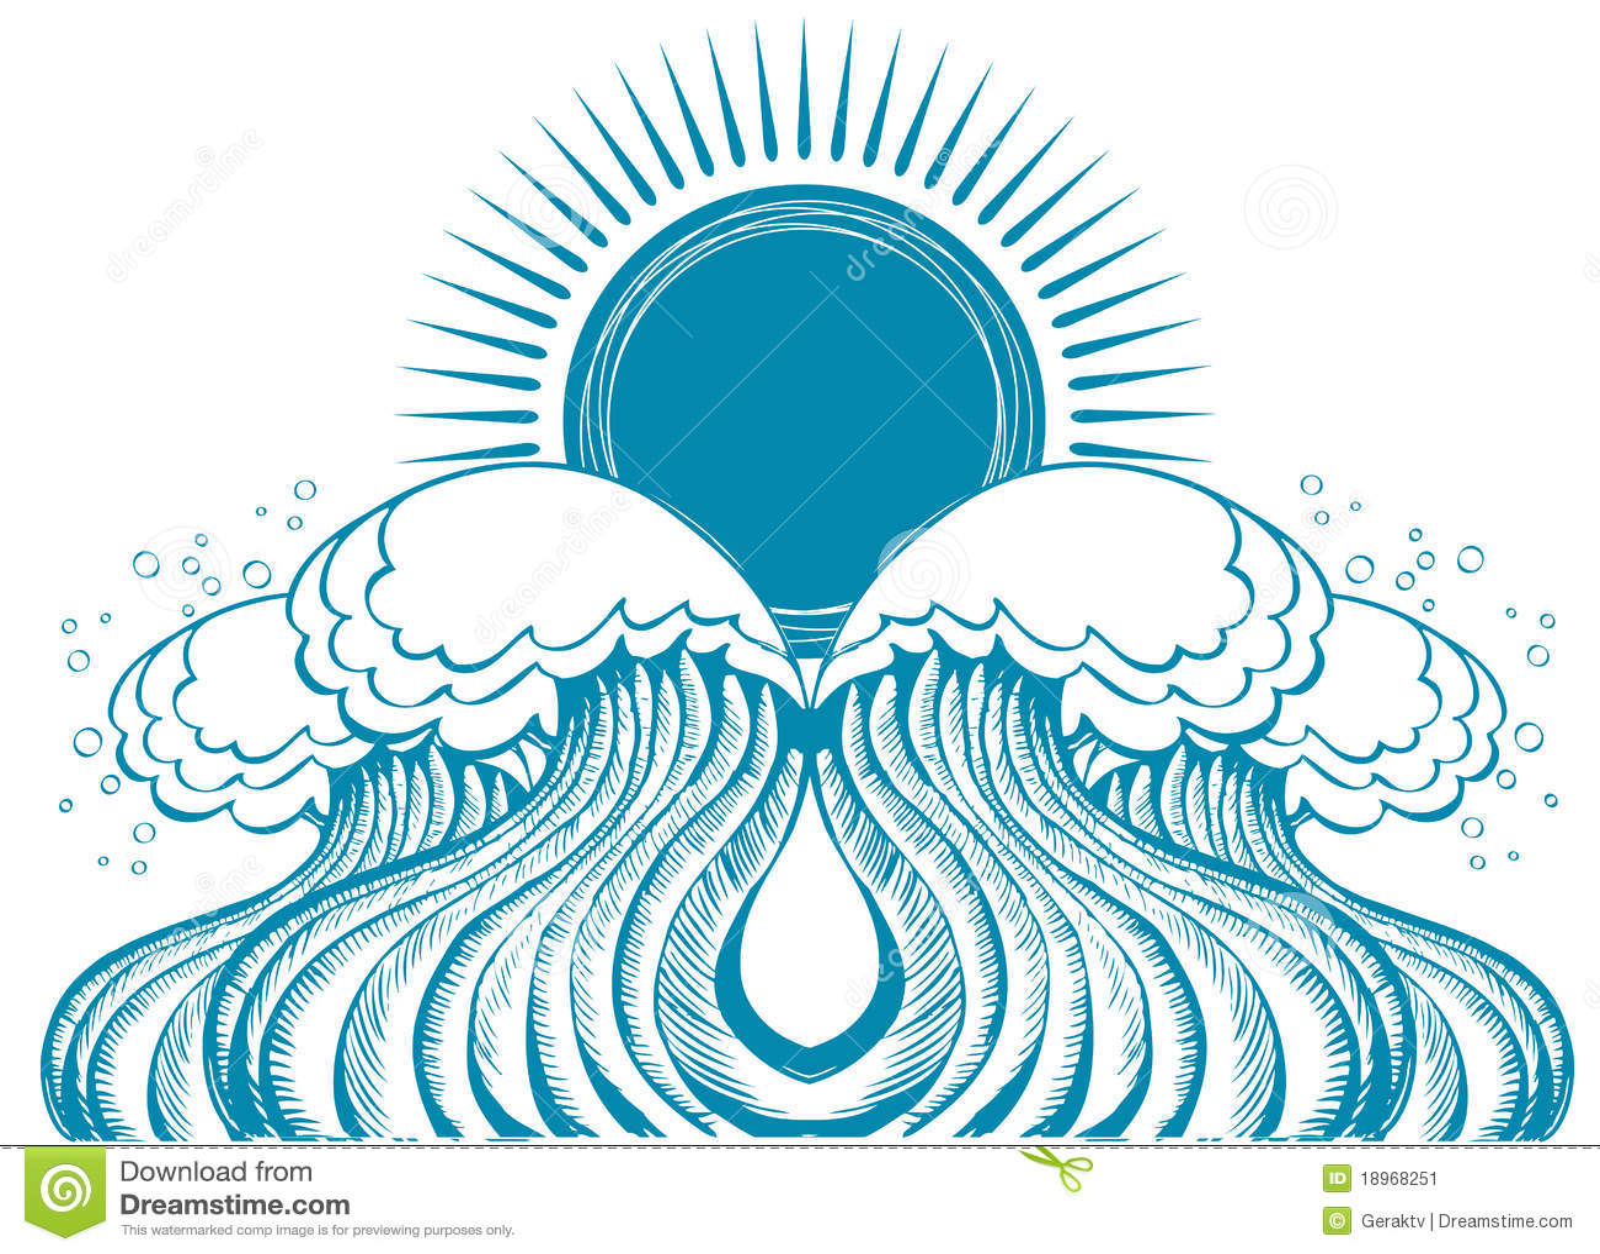 Sea waves vector illustration of symbol of nature stock vector sea waves vector illustration of symbol of nature icon pattern biocorpaavc Choice Image